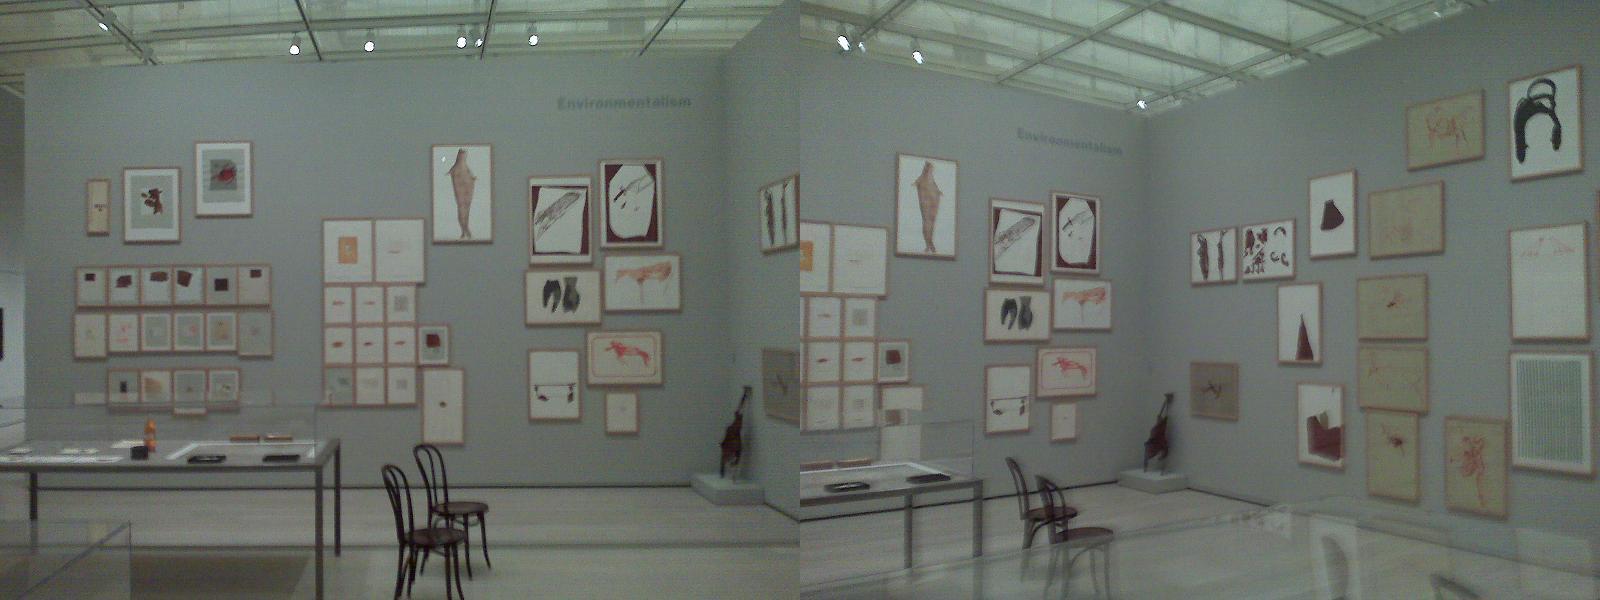 Stuff, stuff, lots of stuff own by the Broad Art Foundation